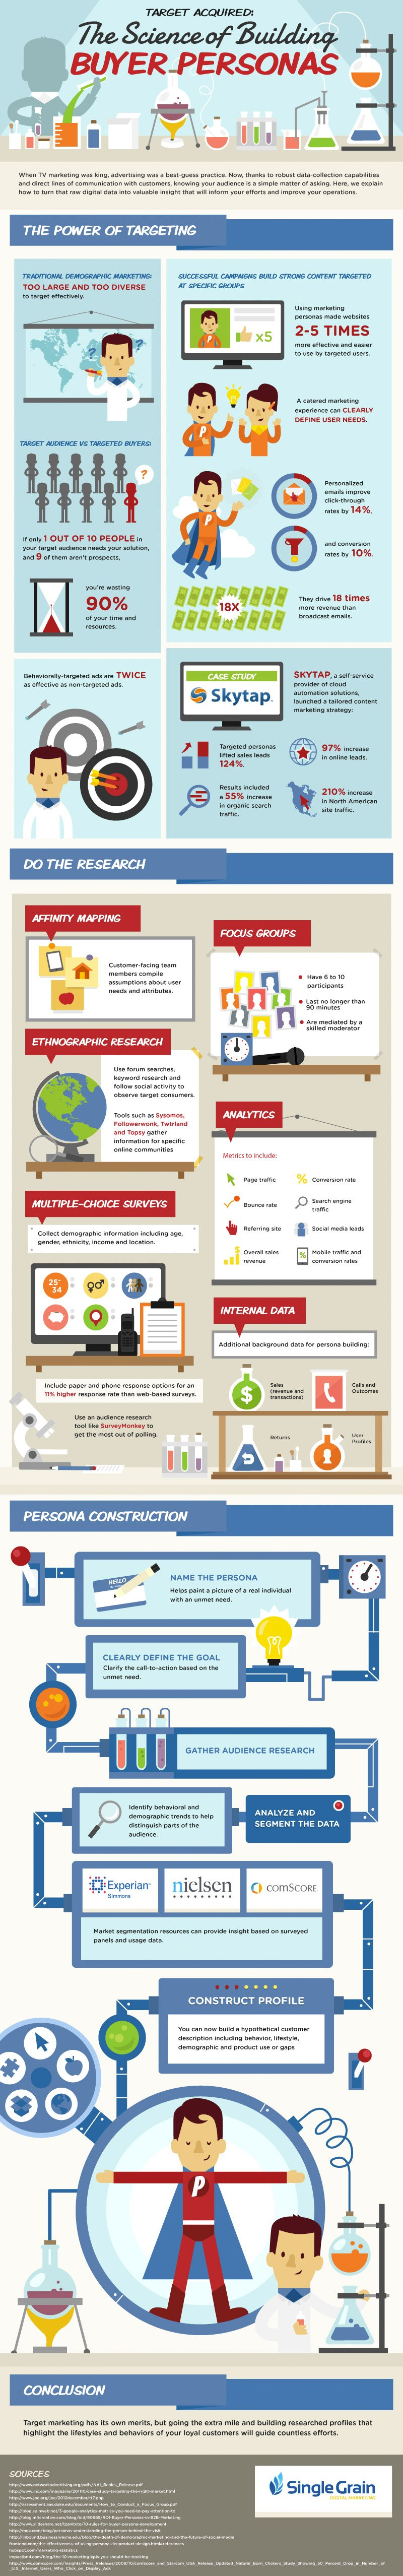 1417473147-science-building-buyer-personas-infographic